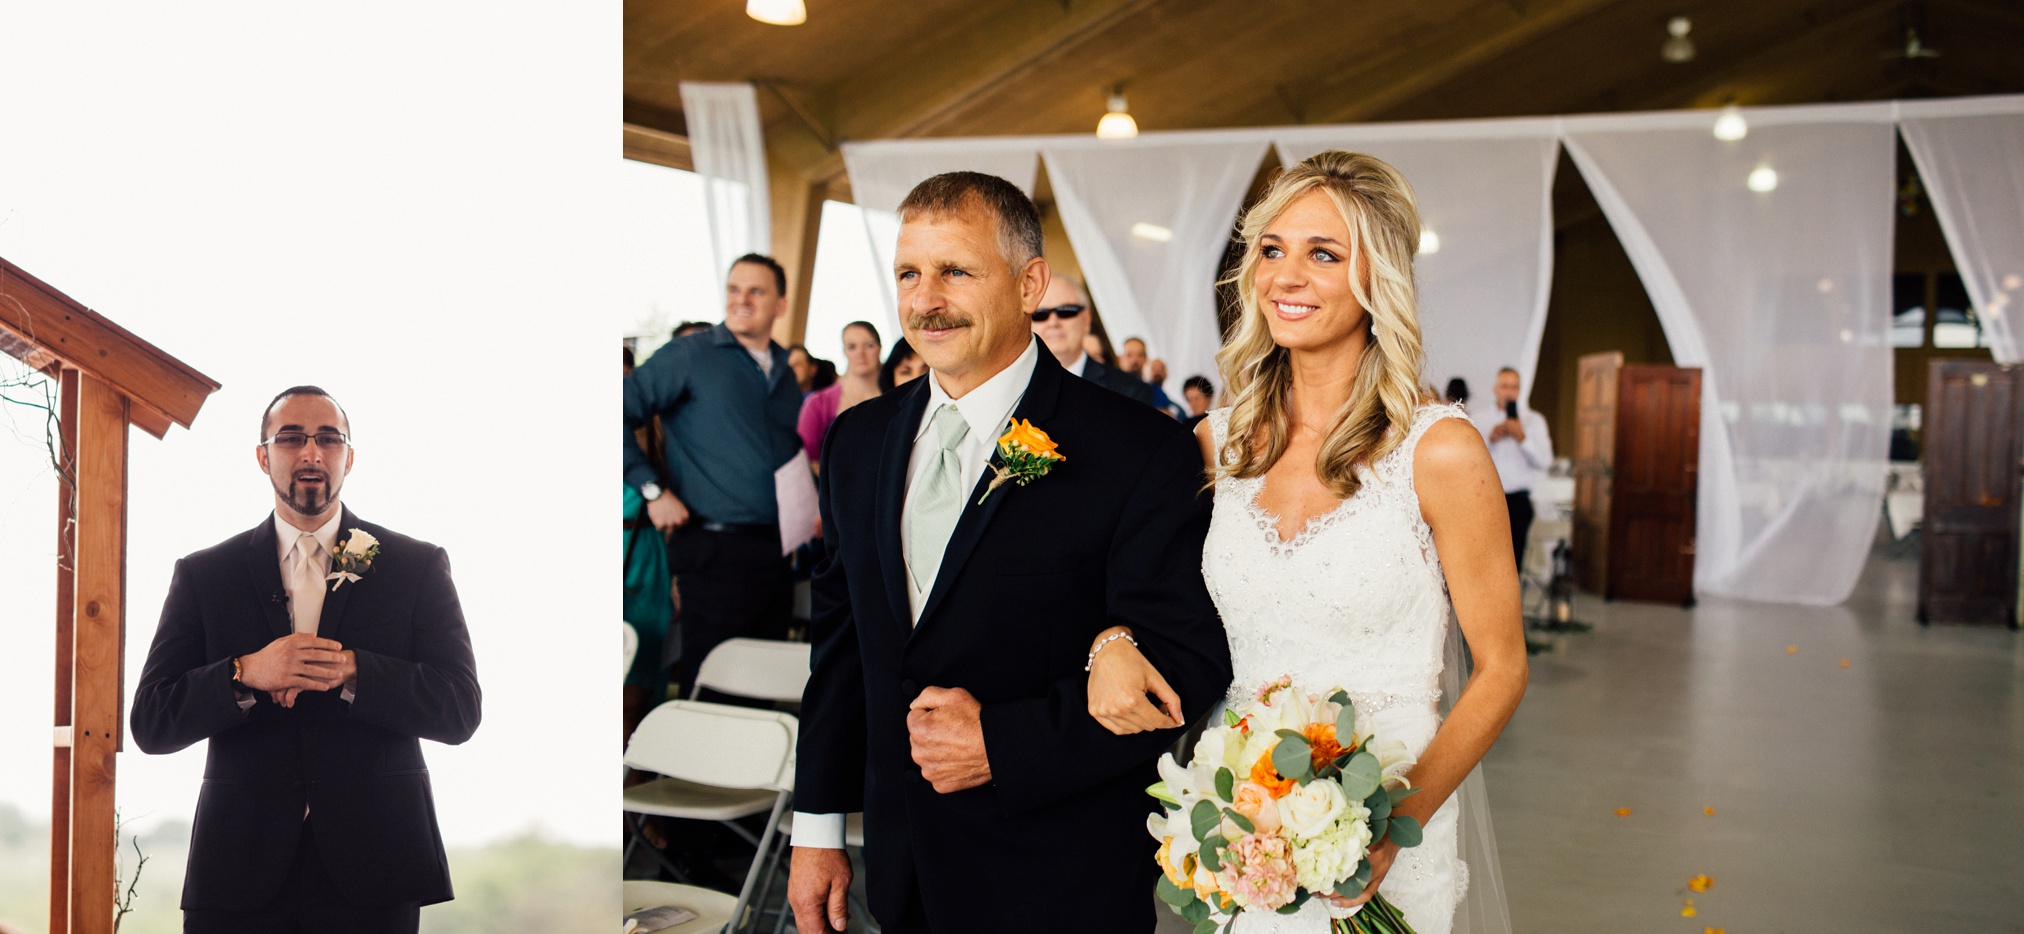 schmid_wedding-387.jpg